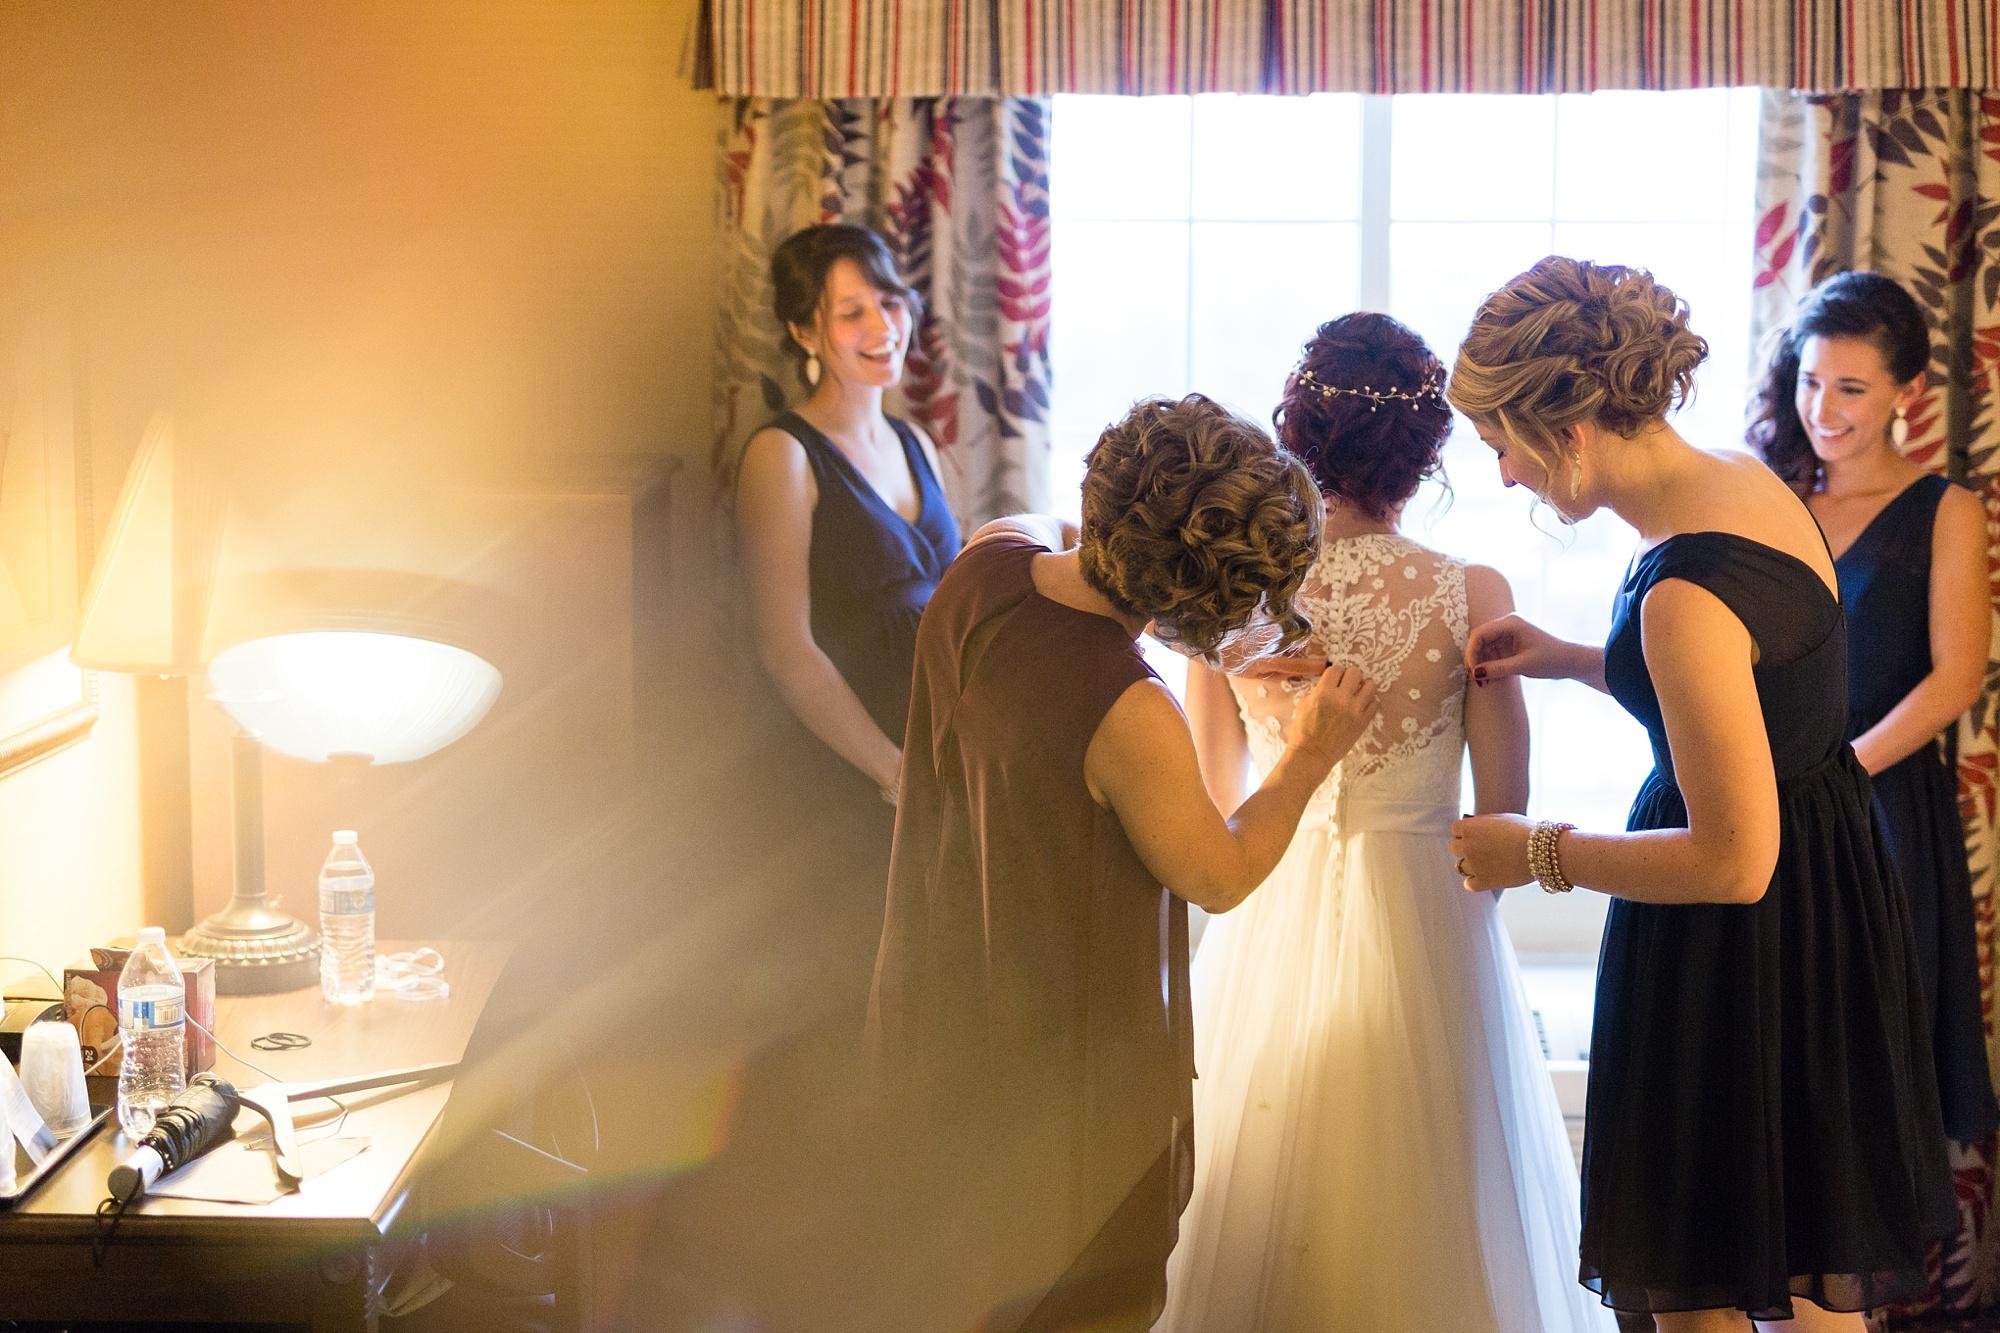 Brandon_Shafer_Photography_Lauren_Ethan_New_Vintage_Place_Grand_Rapids_Wedding_0015.jpg